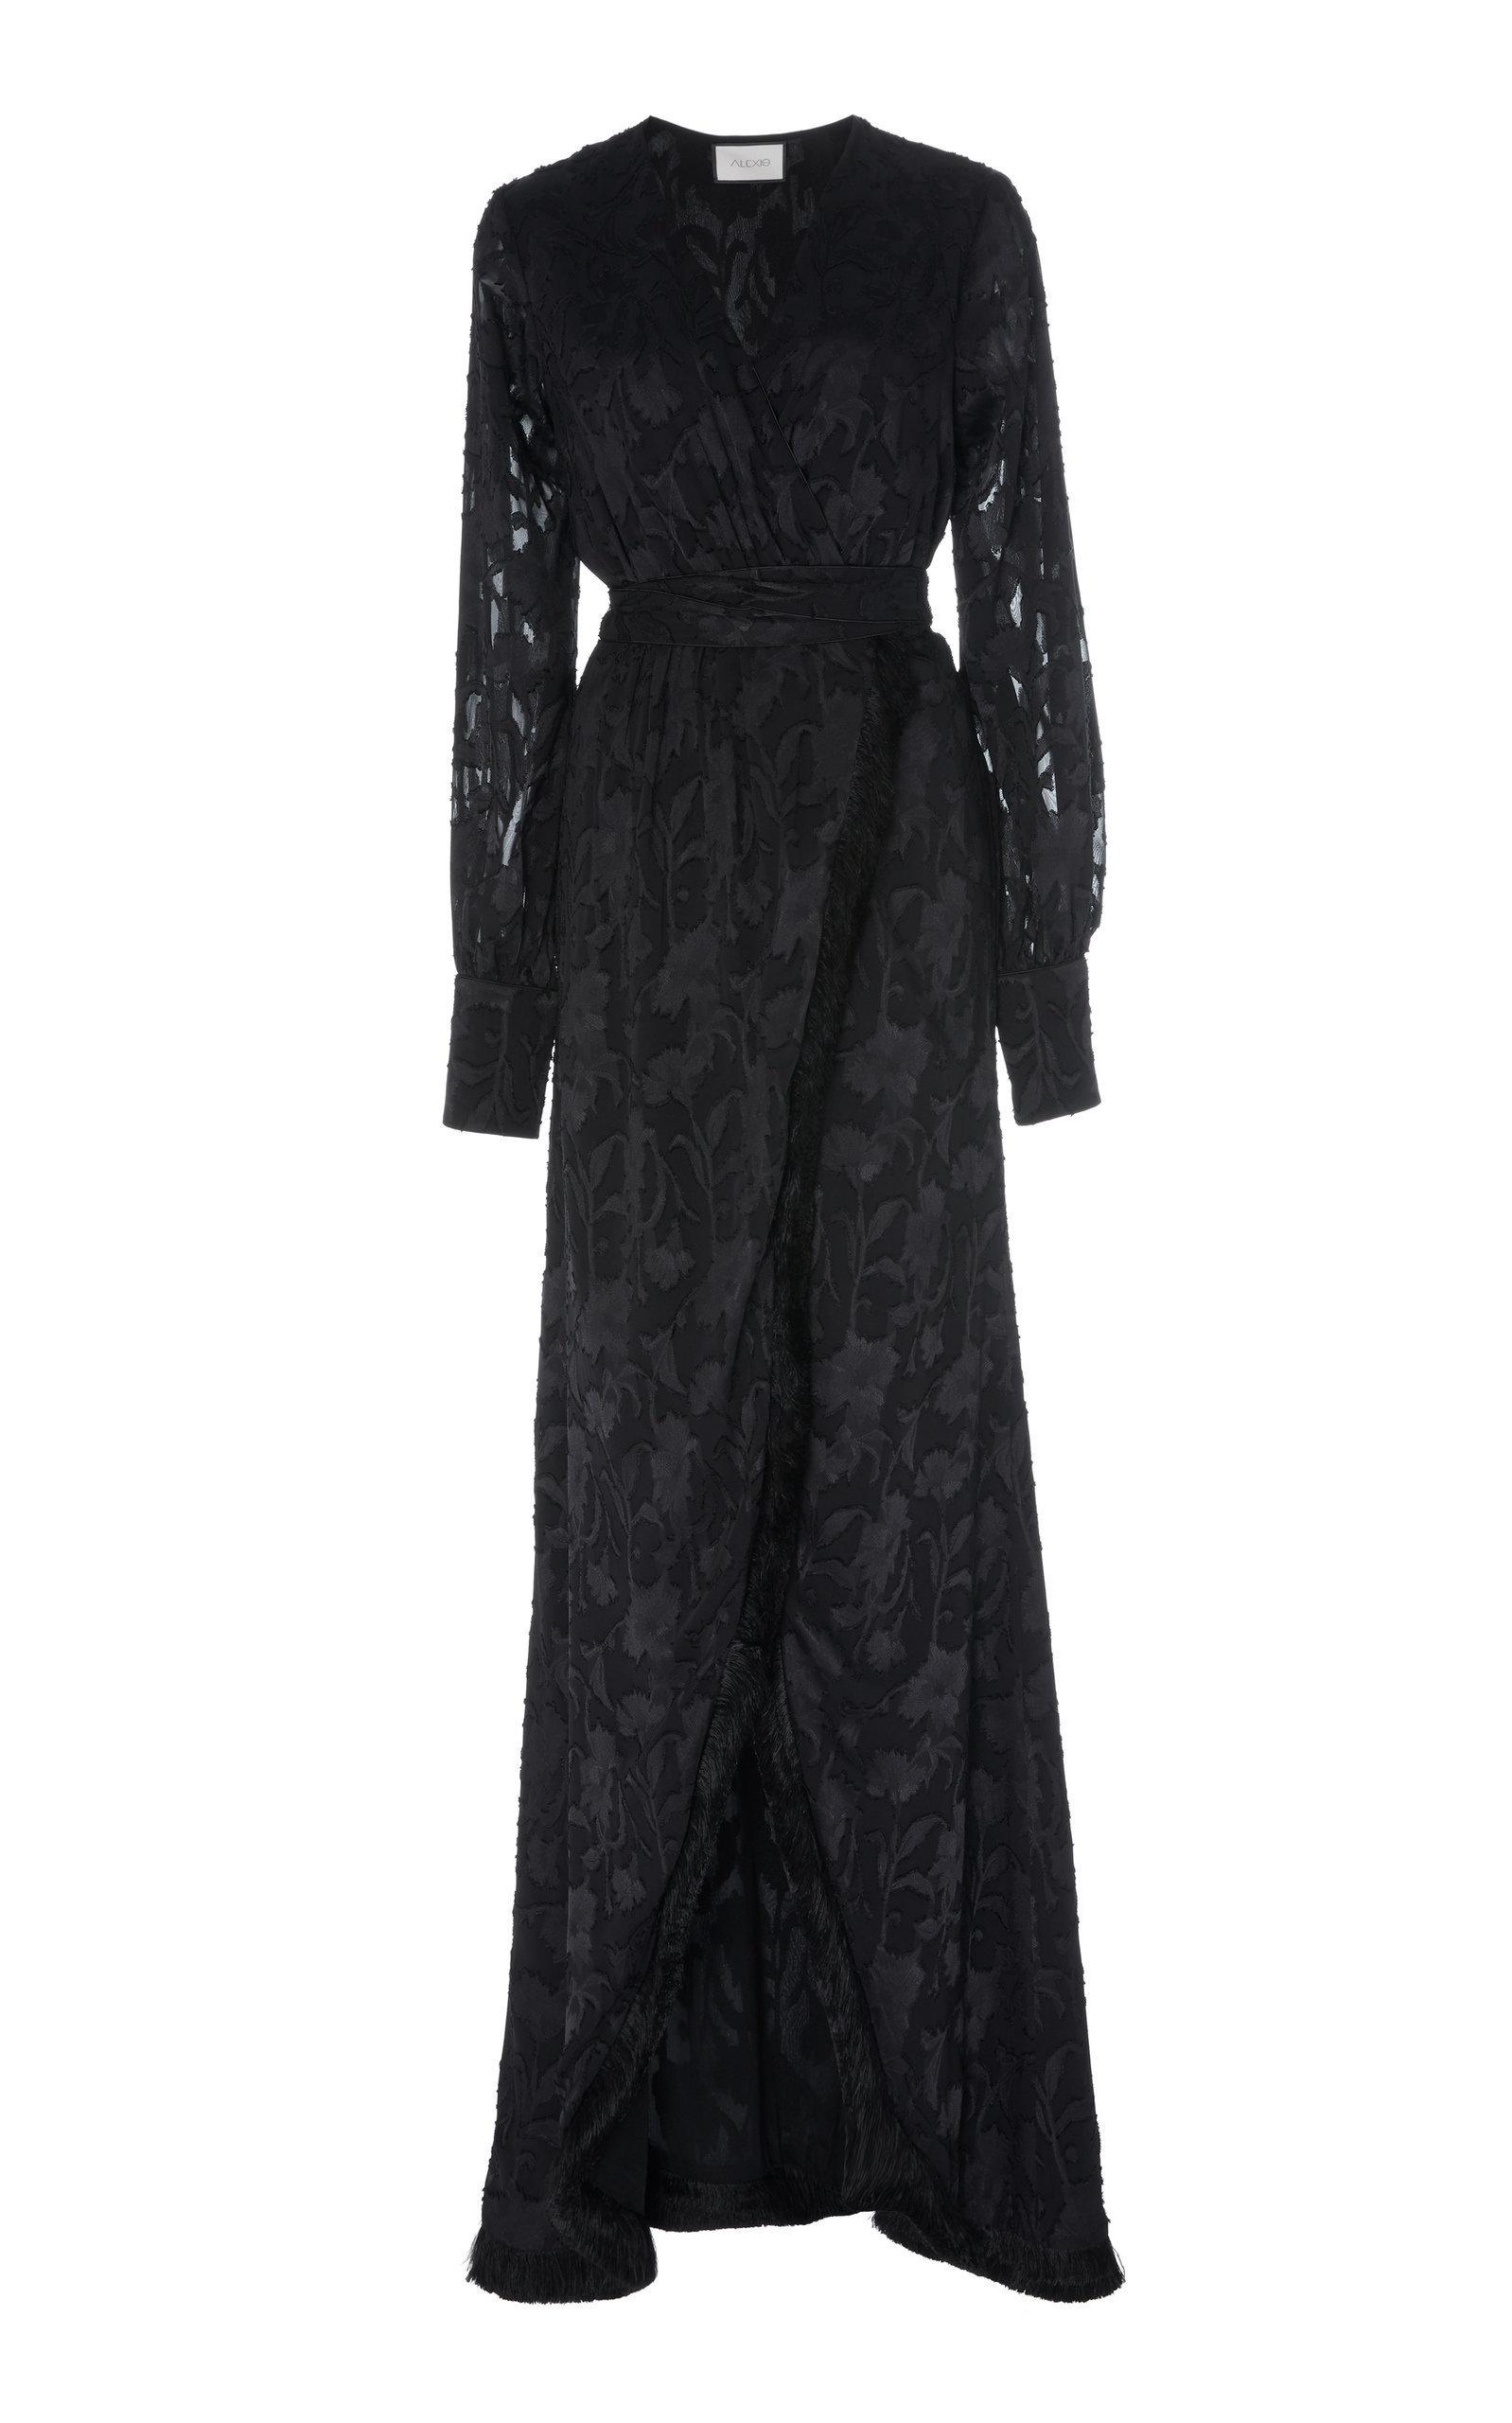 Antonella Fringed Devore Satin Wrap Maxi Dress By Alexis Now Available On Moda Operandi Fashion Dresses Dresses Long Cocktail Dress [ 2560 x 1598 Pixel ]